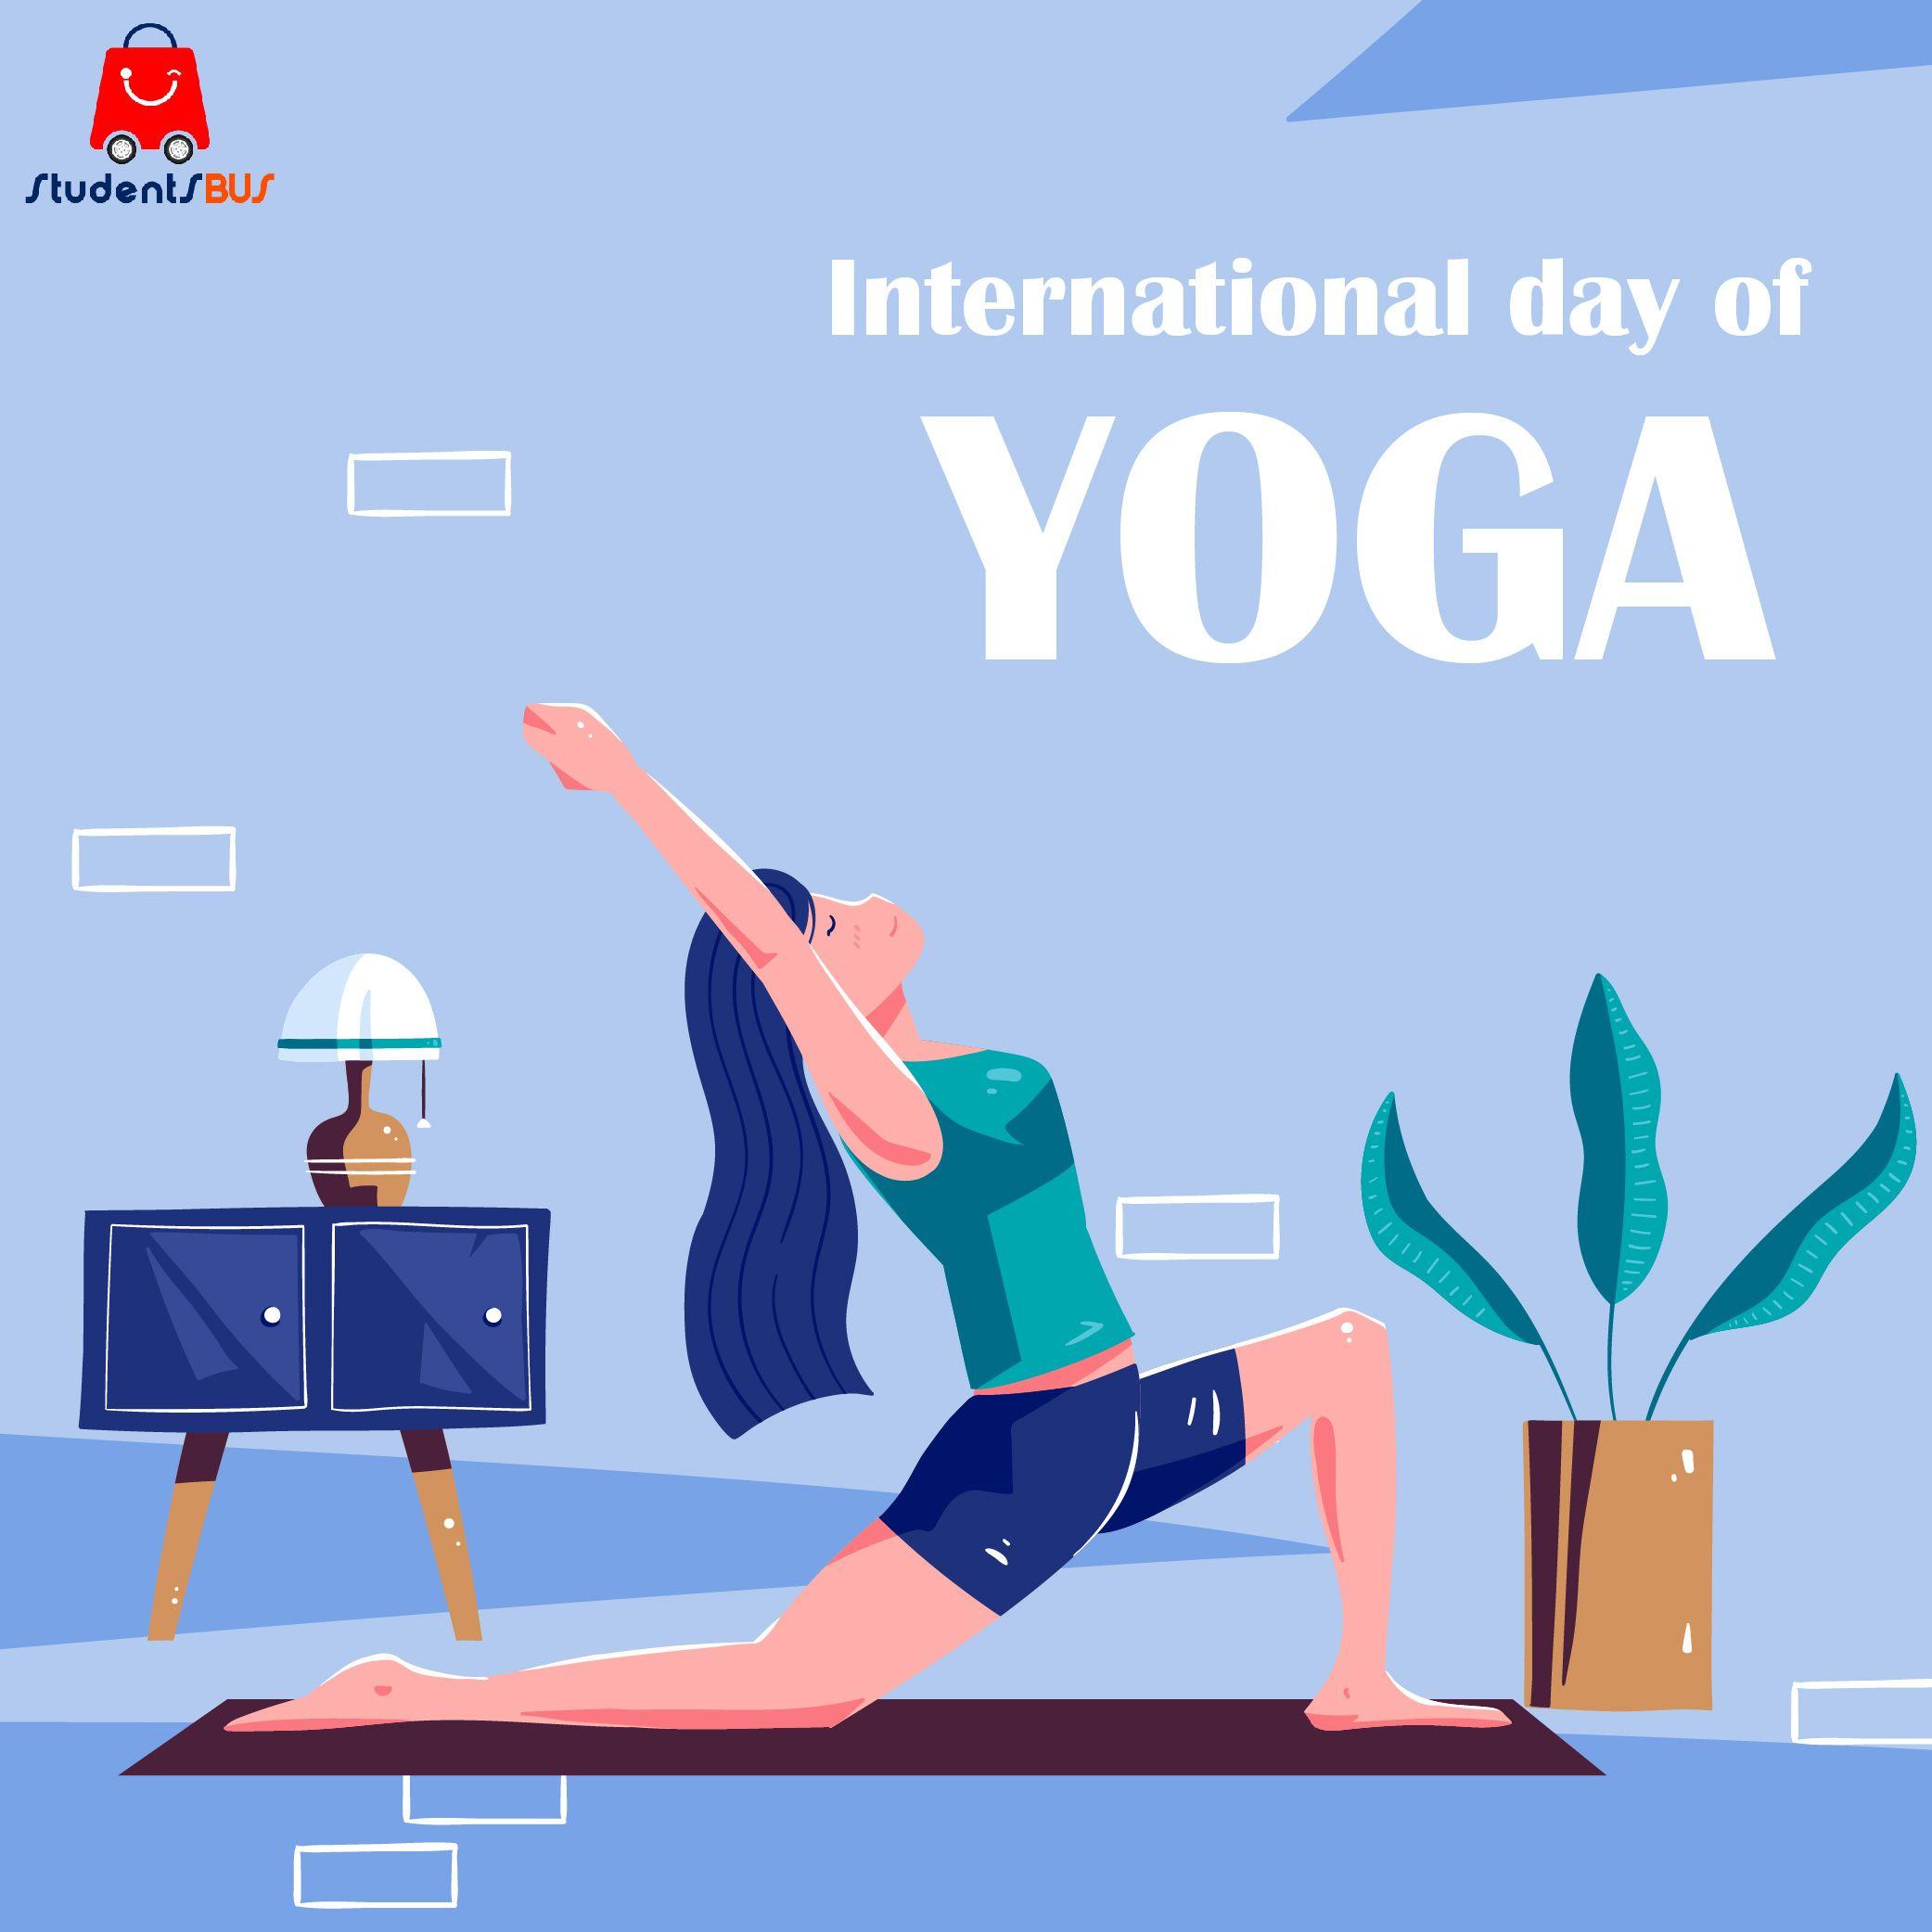 Wish you all International Yoga Day.  #StudentsBus #internationalyogaday #yogahealth #StudentSpirit #StudentSpiritNeverDies #yogacenters #yogaspirit #Besafe #Belocal #happyfathersday #dadslove #VocalForLocal #BesafeBeresponsible #SupportSmallBusiness #lifestyle #ripsushantsingh #mentalhealth #selfcare #mentalawareness #dadscare #StudentsSpiritLivesForever #CasualWear #LifestyleClothing #Trend #TshirtFashion #WomenWear #Quarantine2020 #Covid19 #FashionTrends #golocal